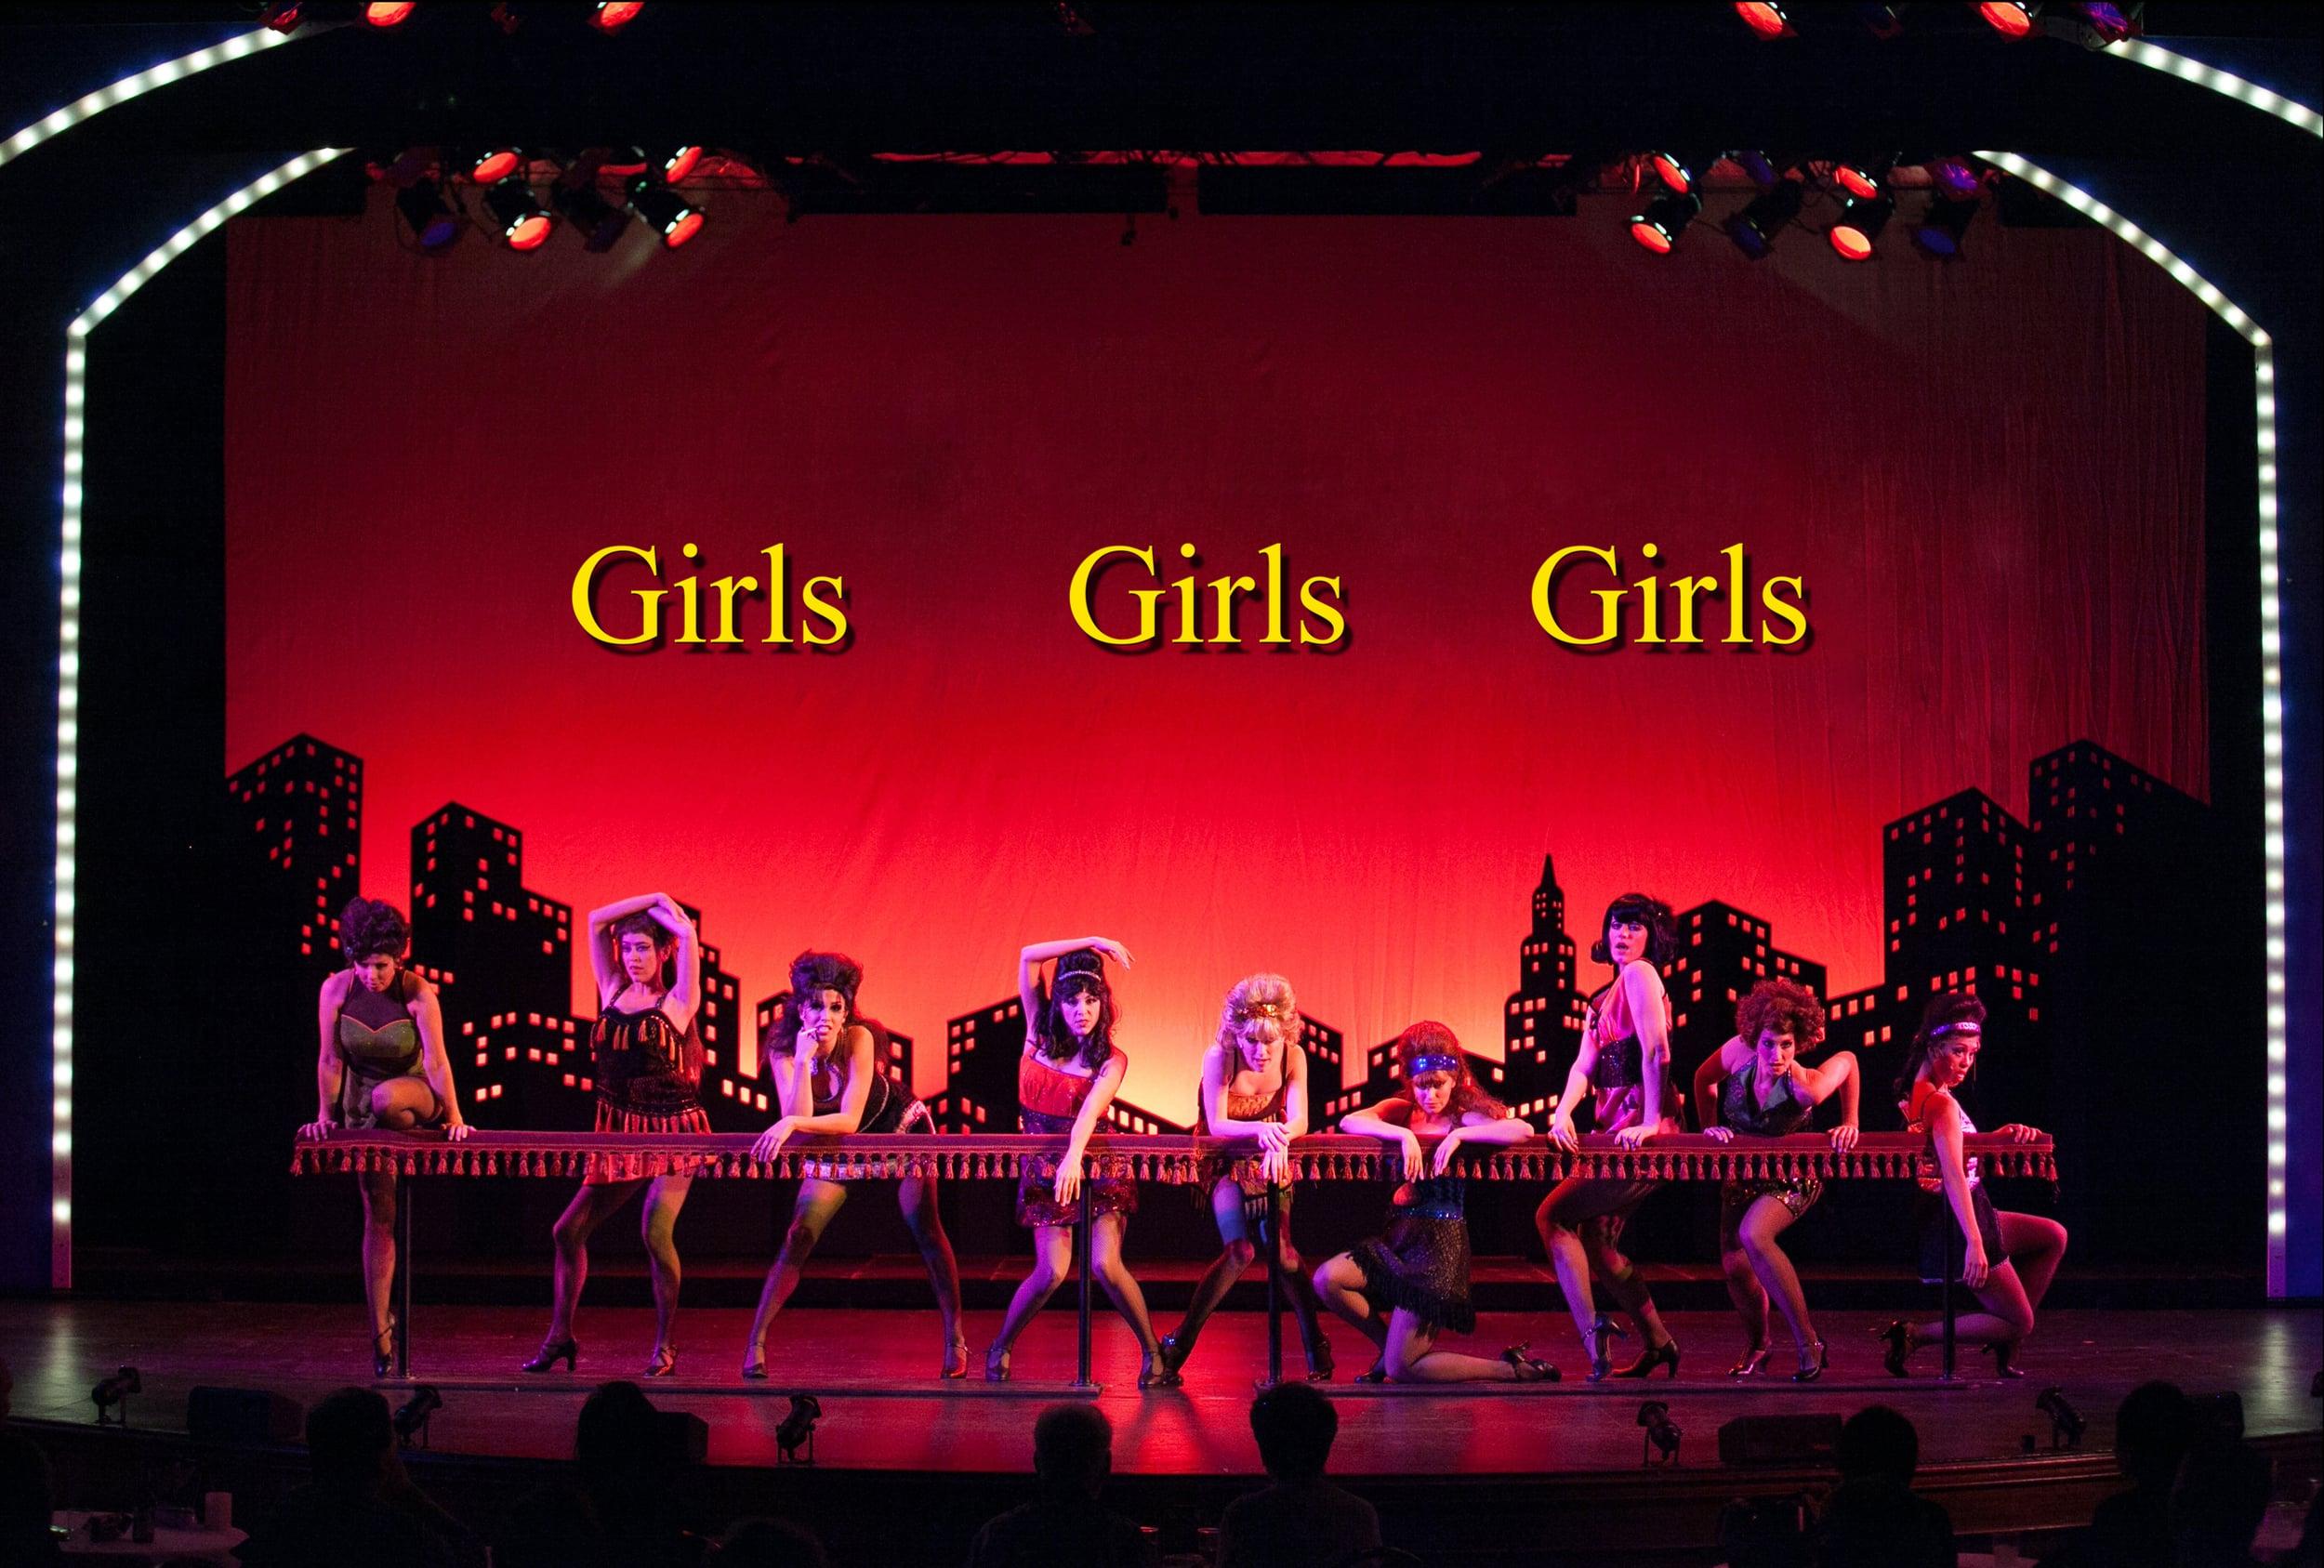 GIRLS GILS GIRLS Stage Dancers about backs.jpg